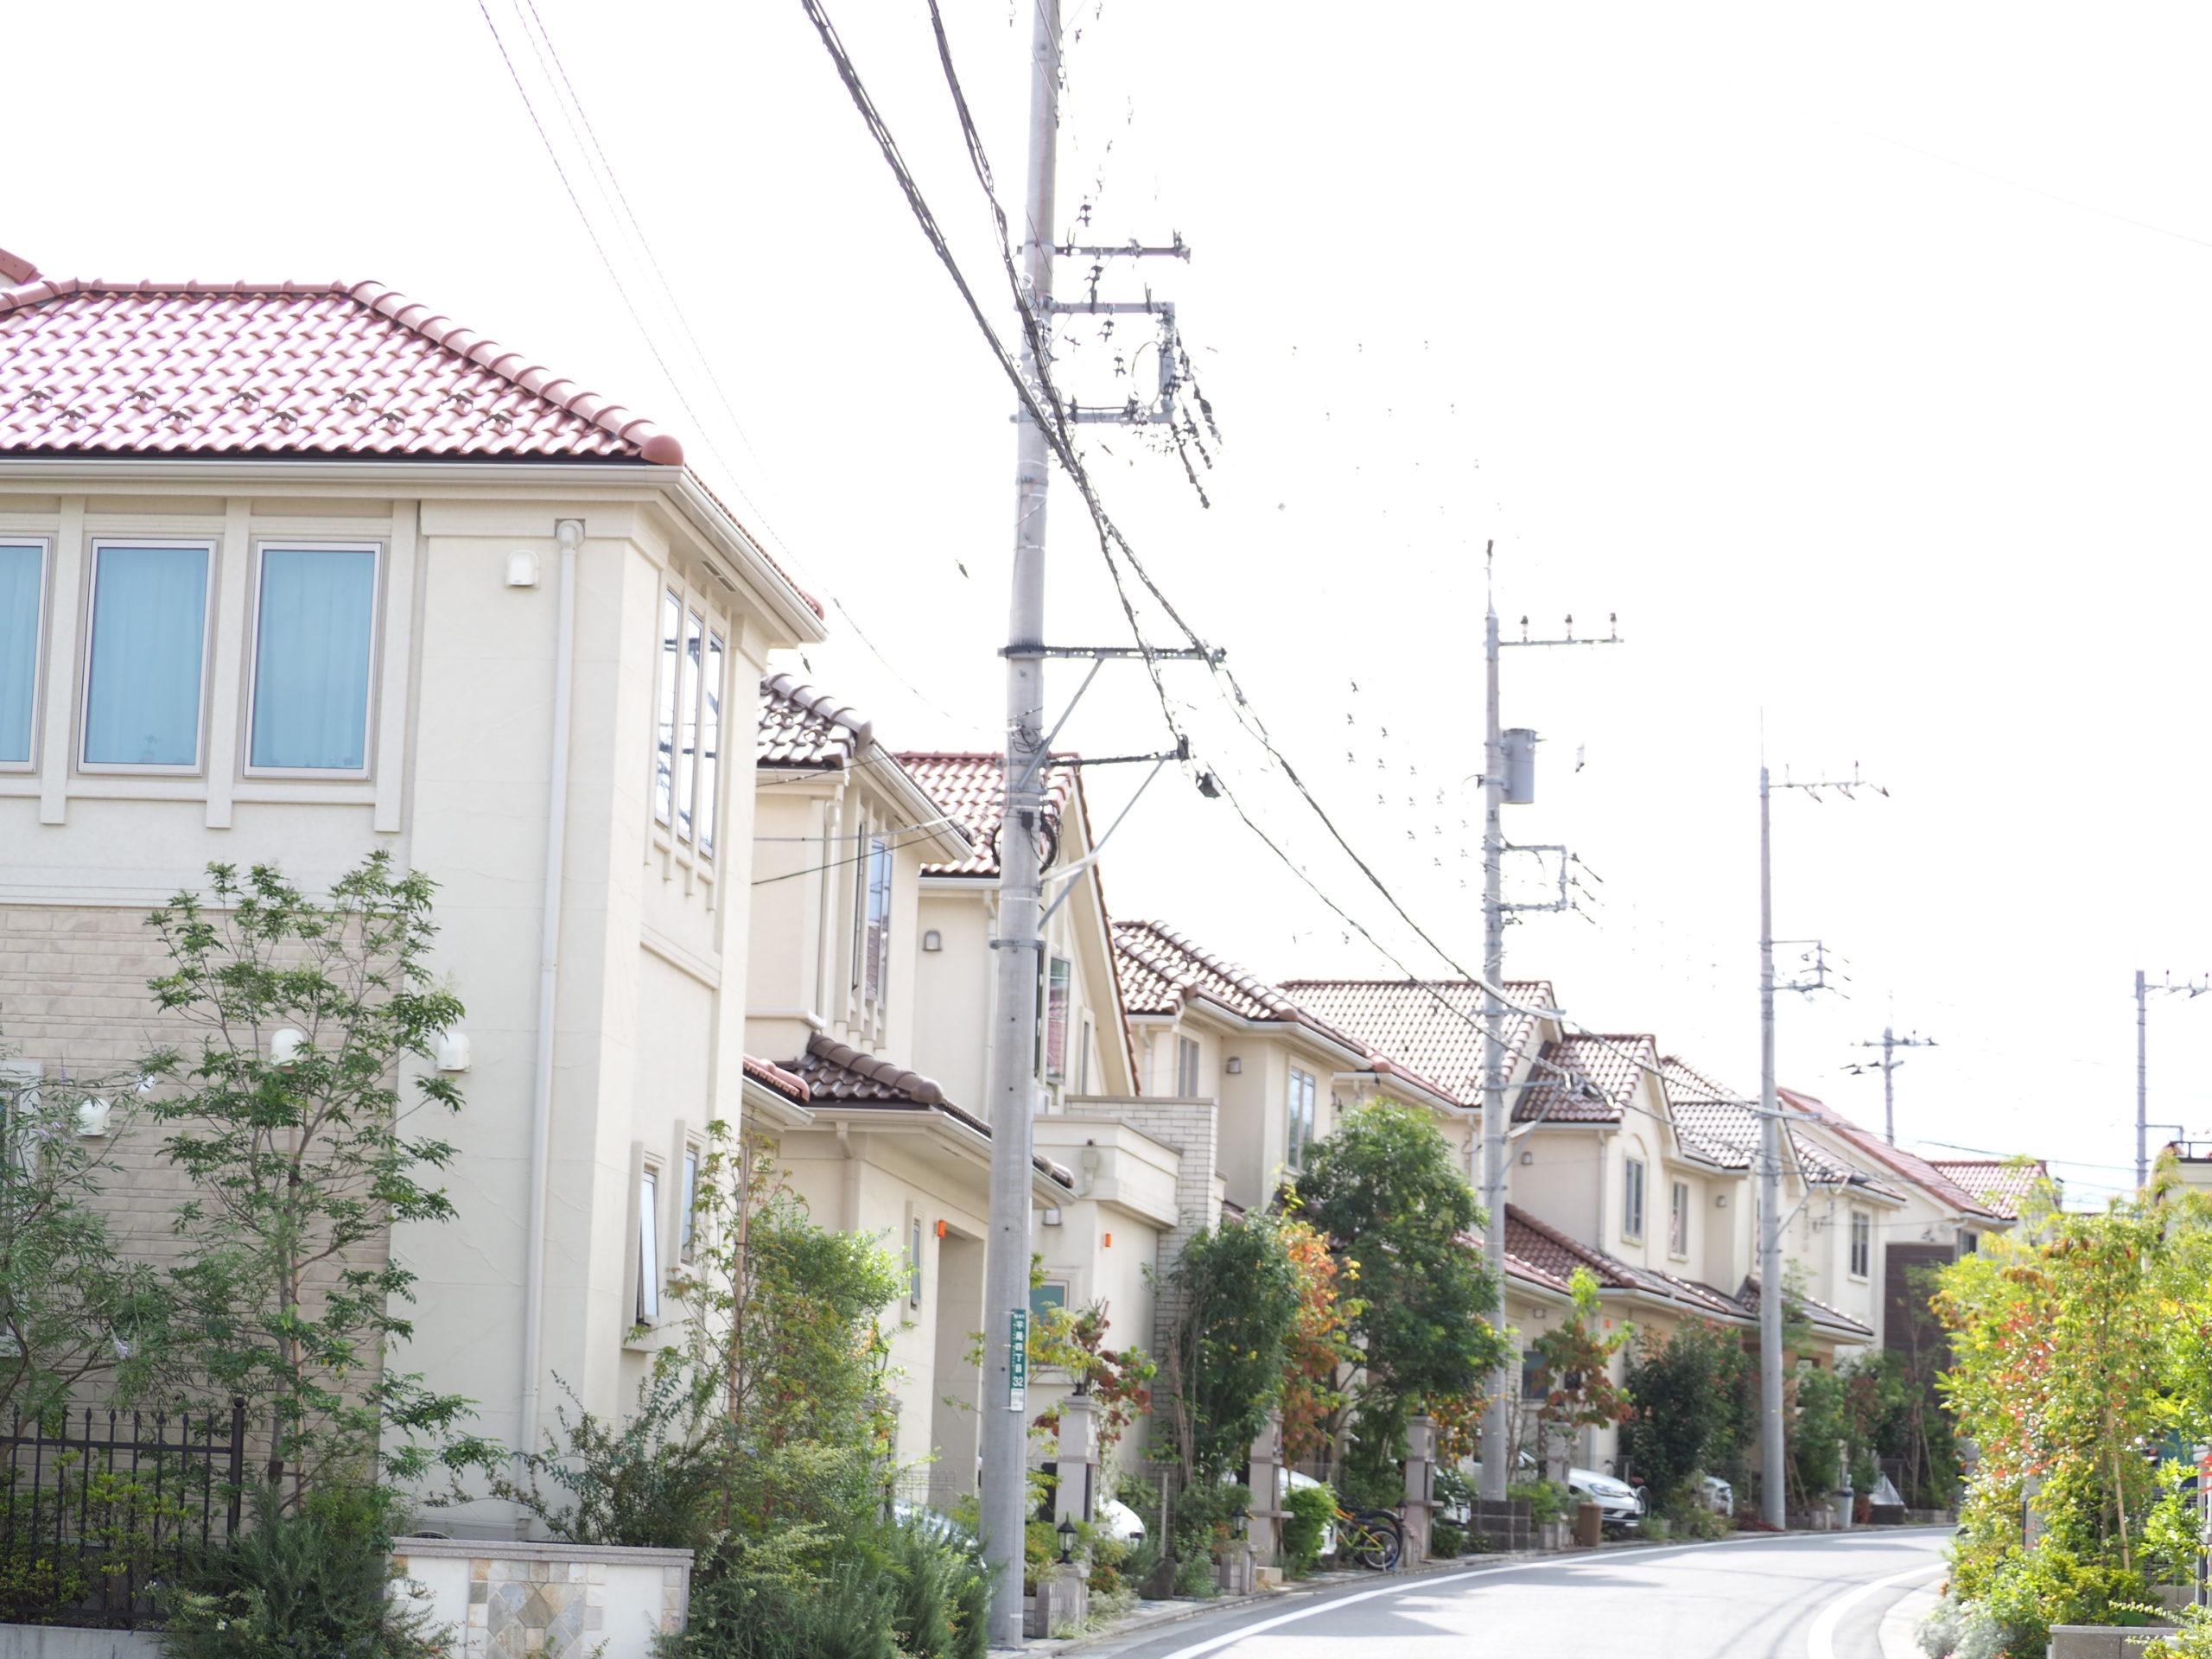 既存住宅購入時の建物検査の利用は47・7%―重説書類の電子交付に8割超が利用意向・不動産流通経営協会